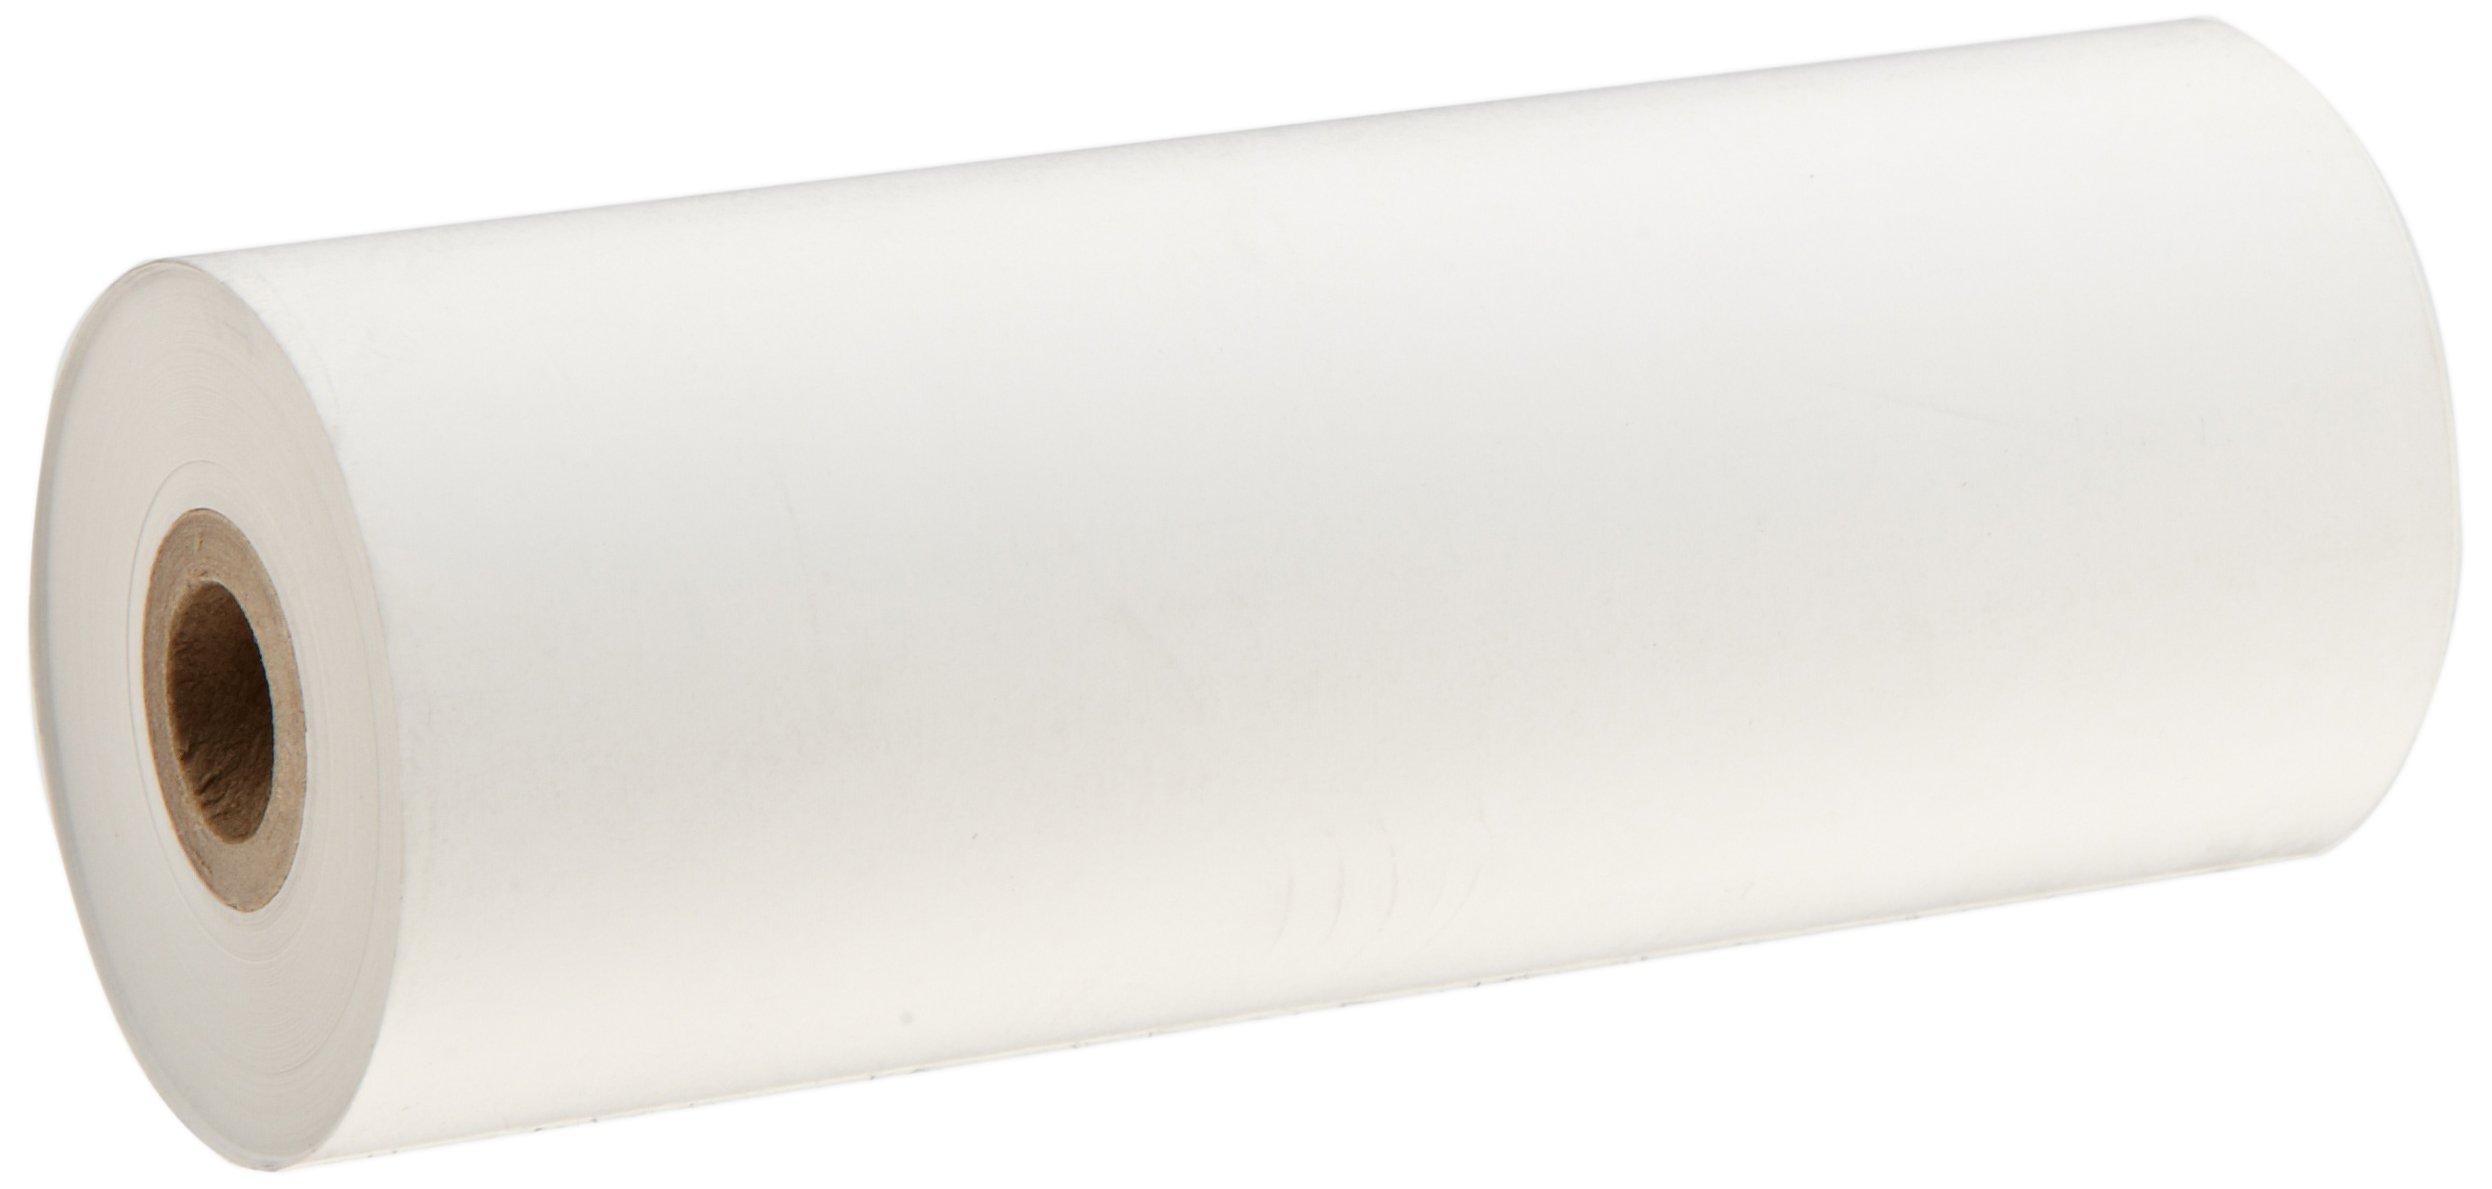 Megger 26999 Thermal Paper for Battery Impedance Test Equipment